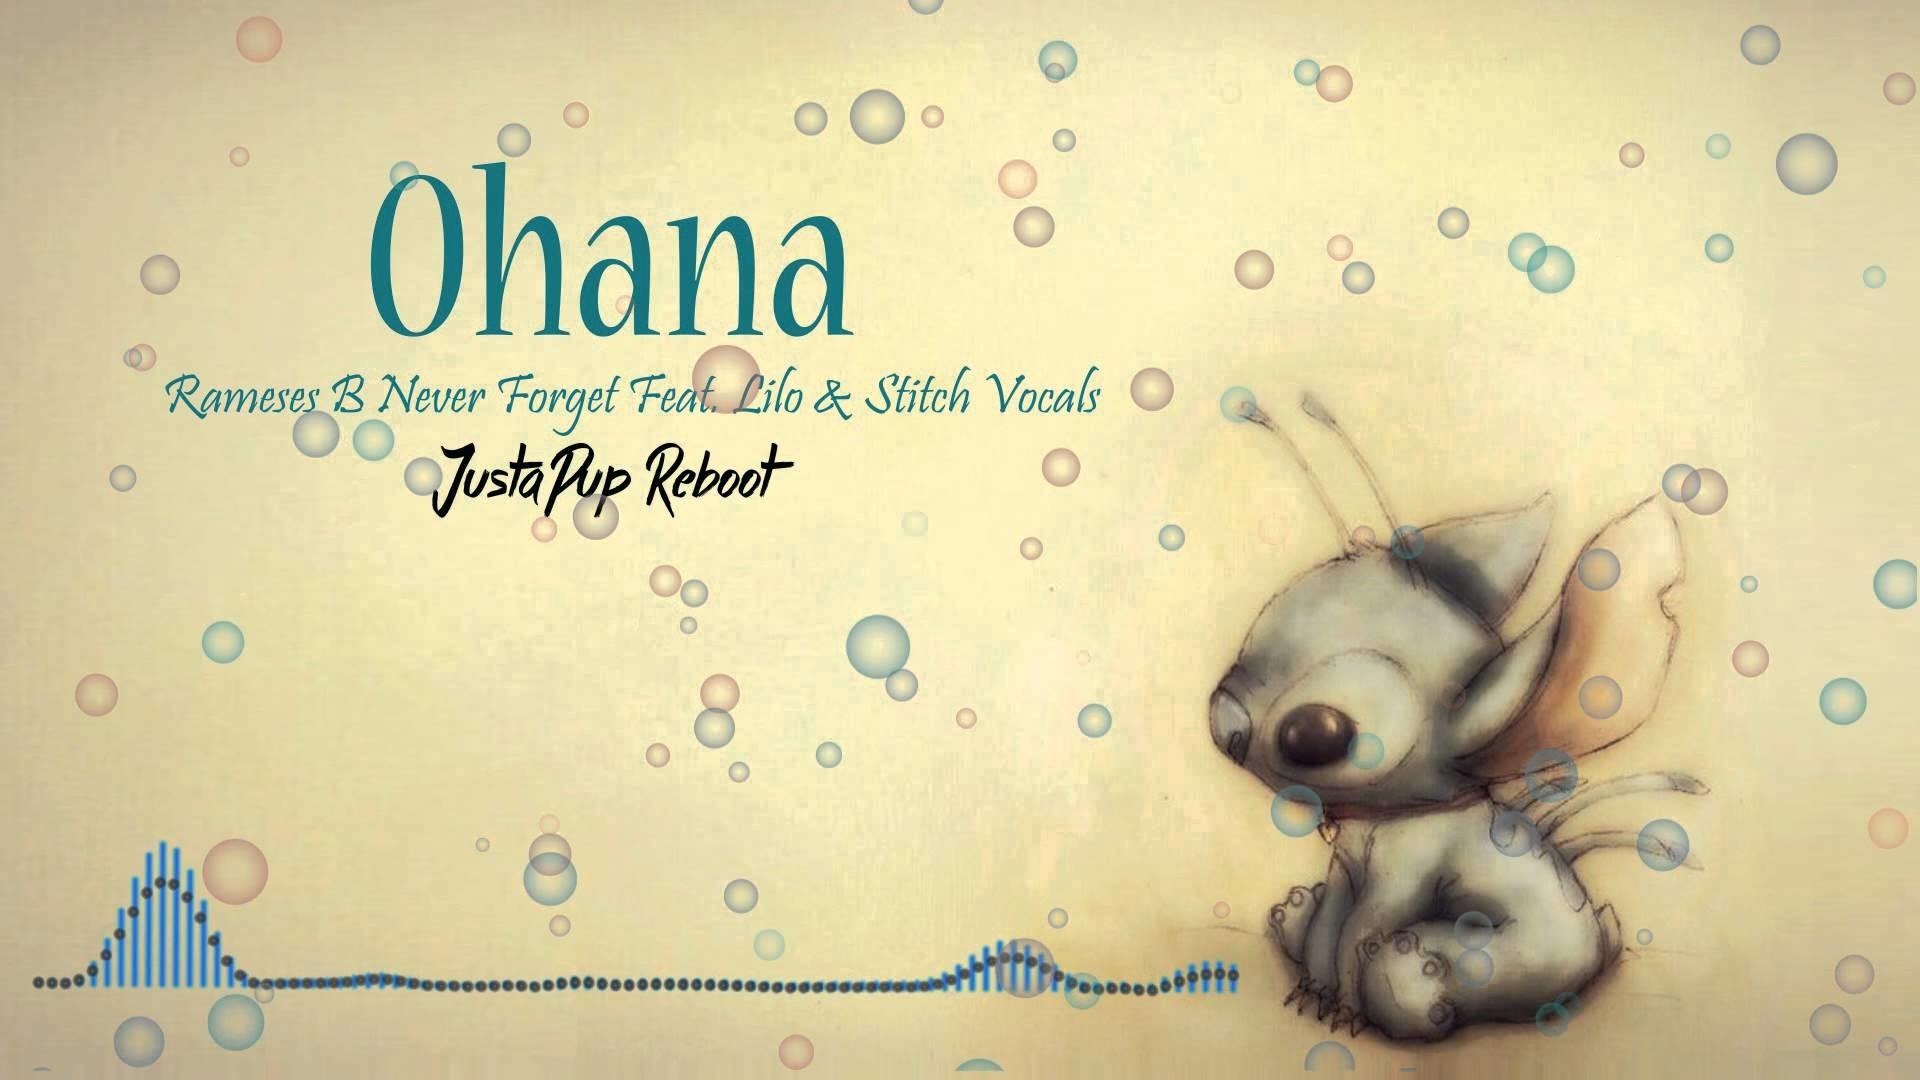 Stitch Desktop Wallpaper Posted By John Johnson